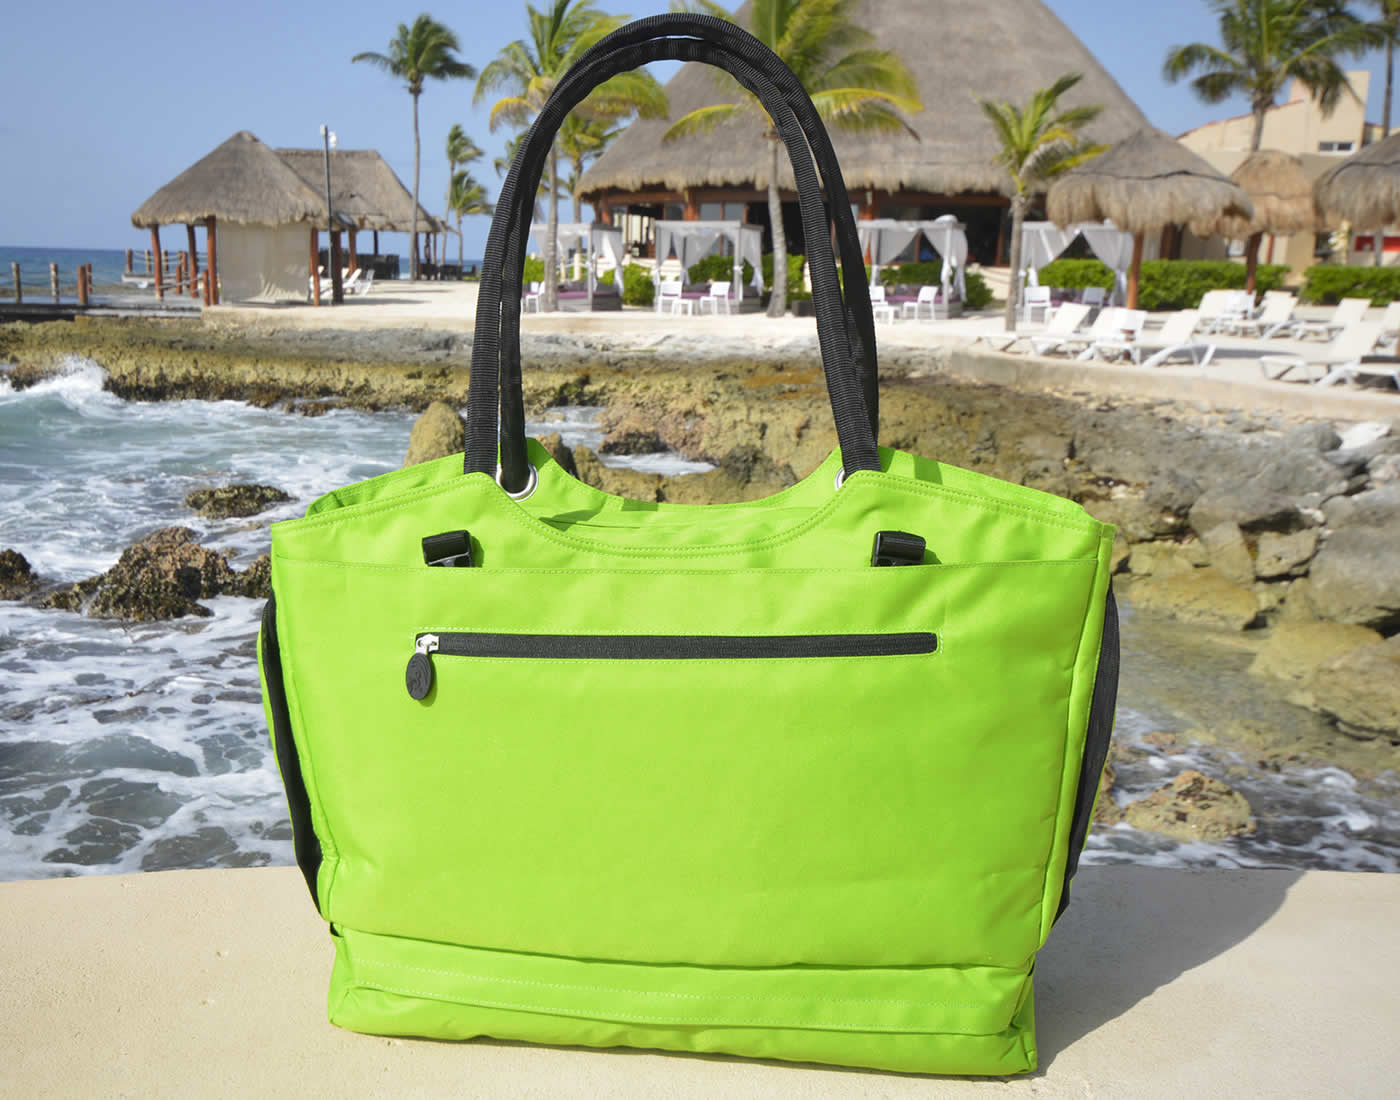 Sea Green Backpack Pastel Bag for holiday Beach Bag Sport Bag Waterproof bag Lootbag classic LootbagShop